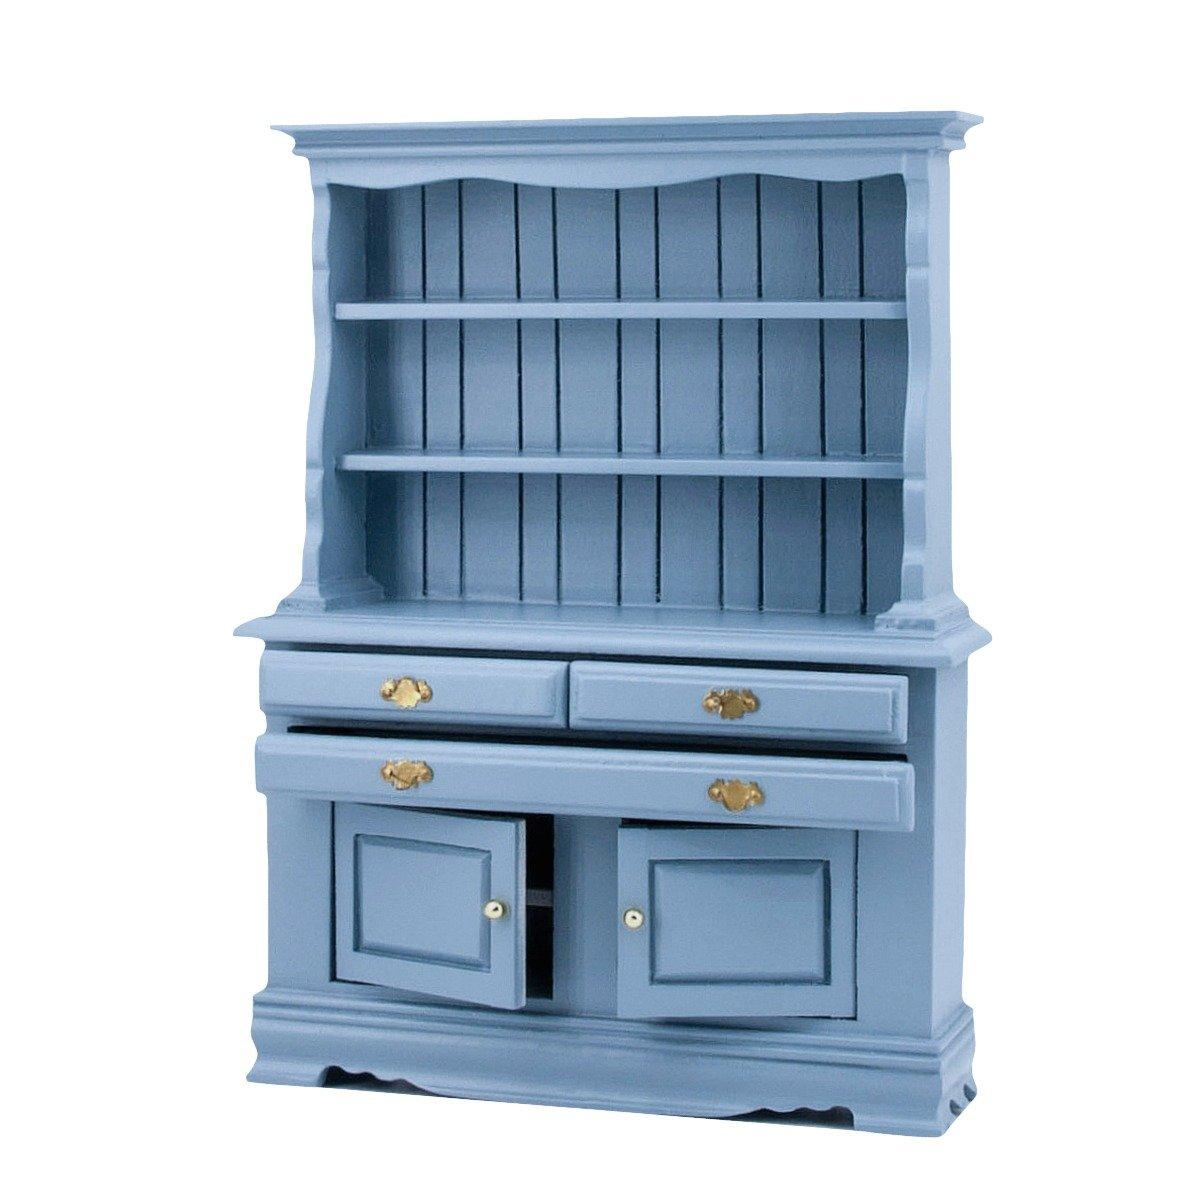 Blaue kuchenschranke for Mobelfolie kuchenschranke